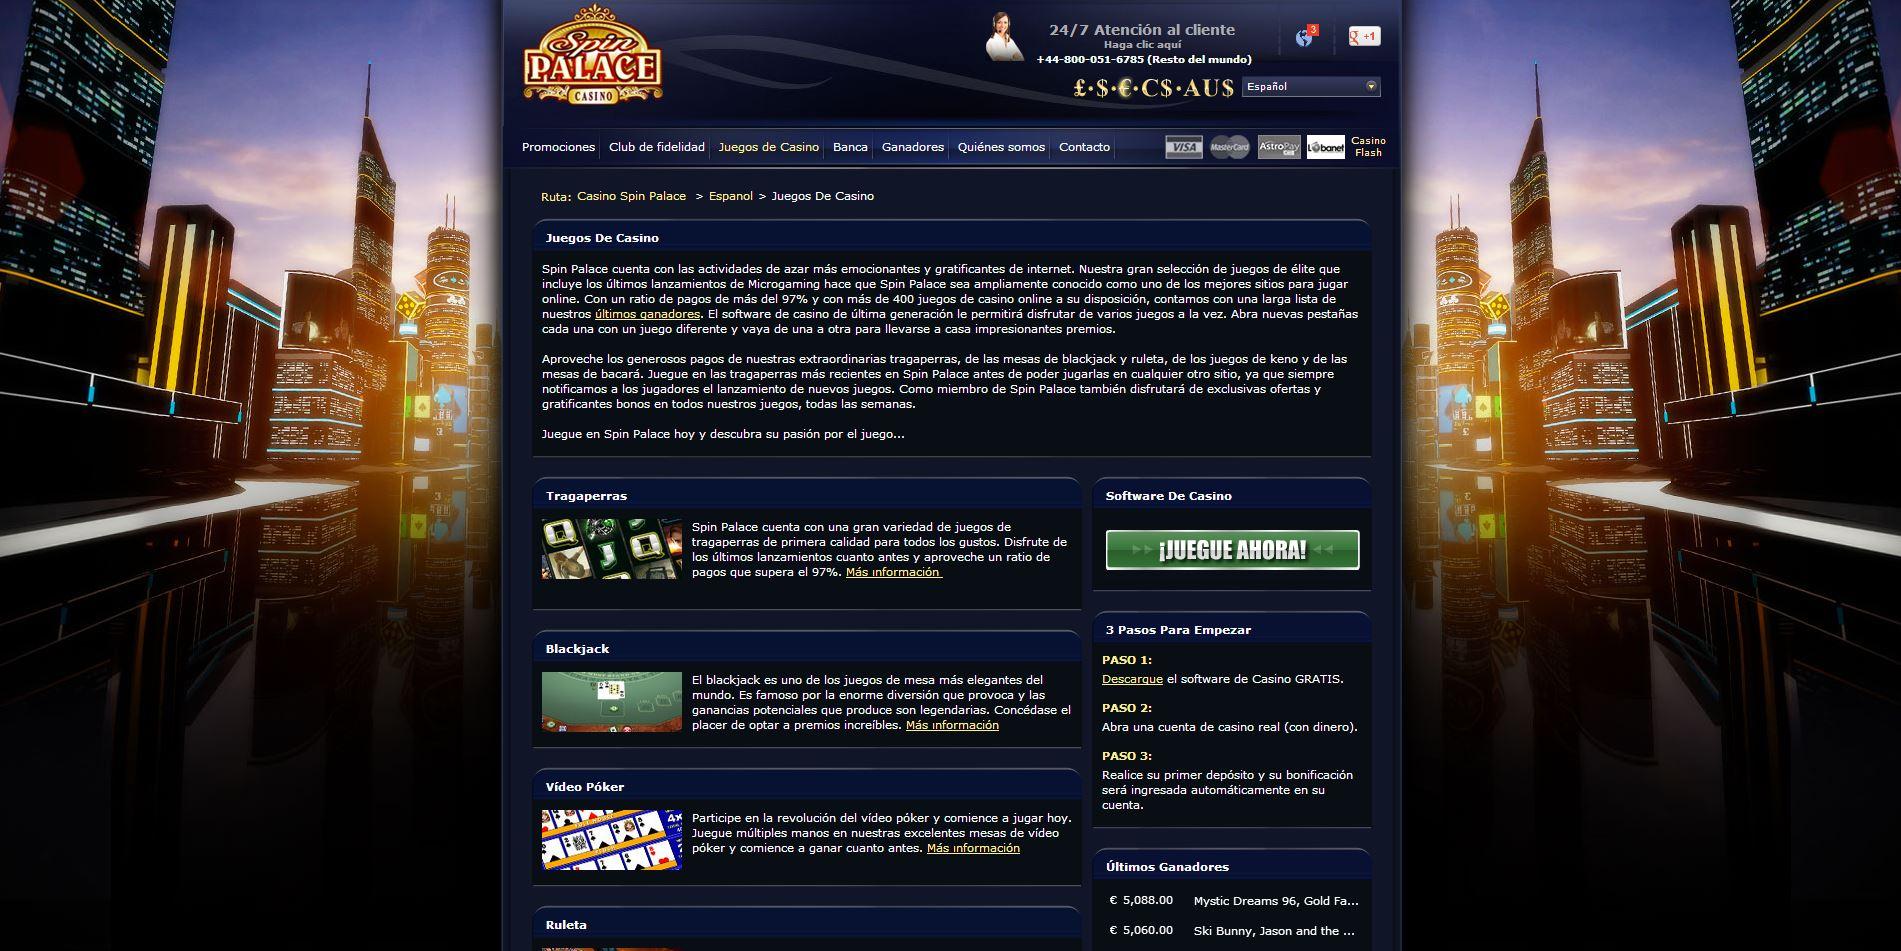 Spin palace es seguro bono sin deposito casino Valparaíso 2019-676277